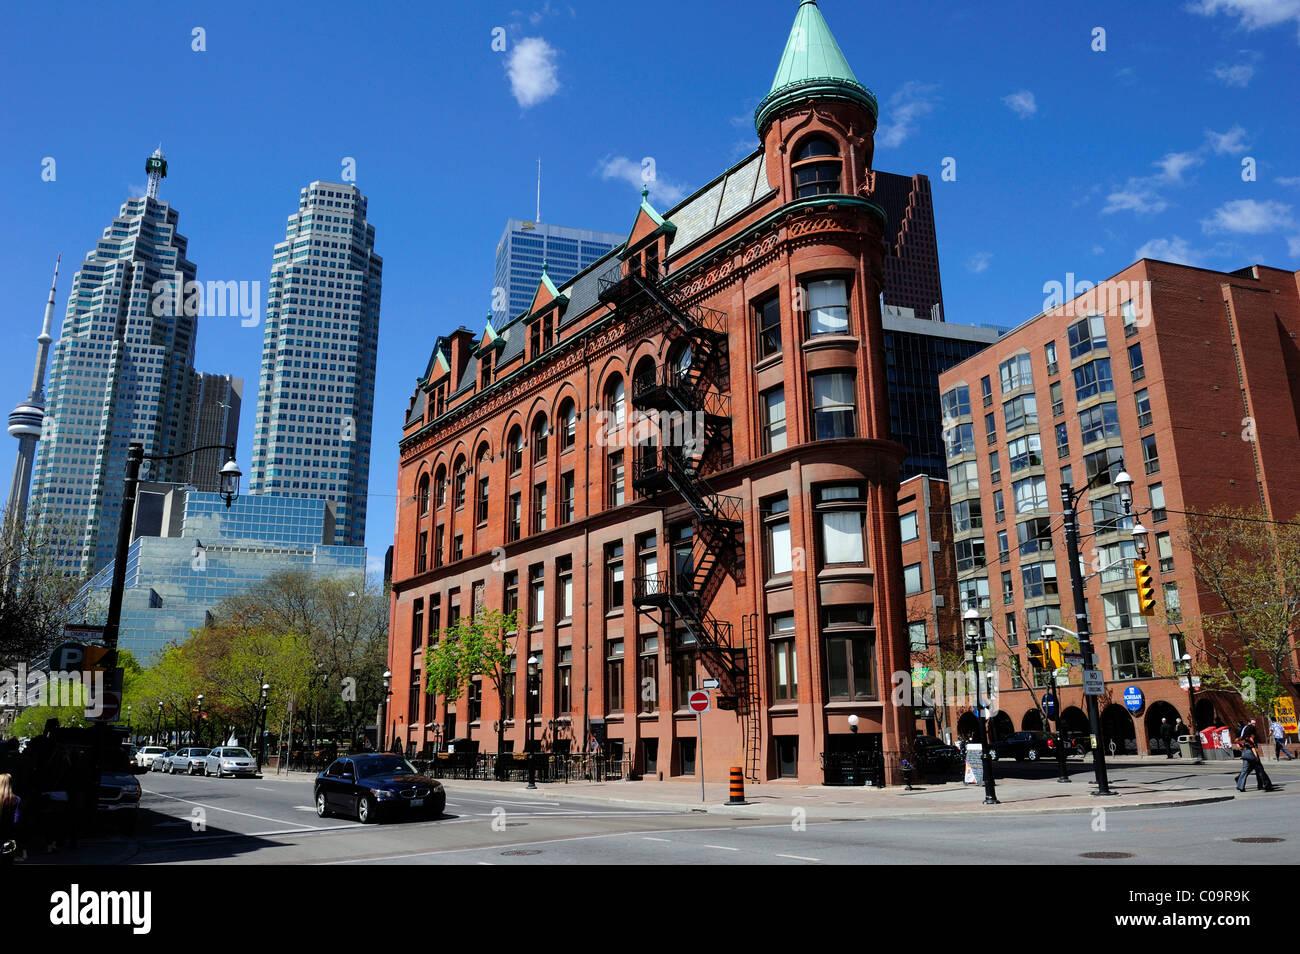 Cruce de frente y Wellington Street, Toronto, Ontario, Canadá Imagen De Stock